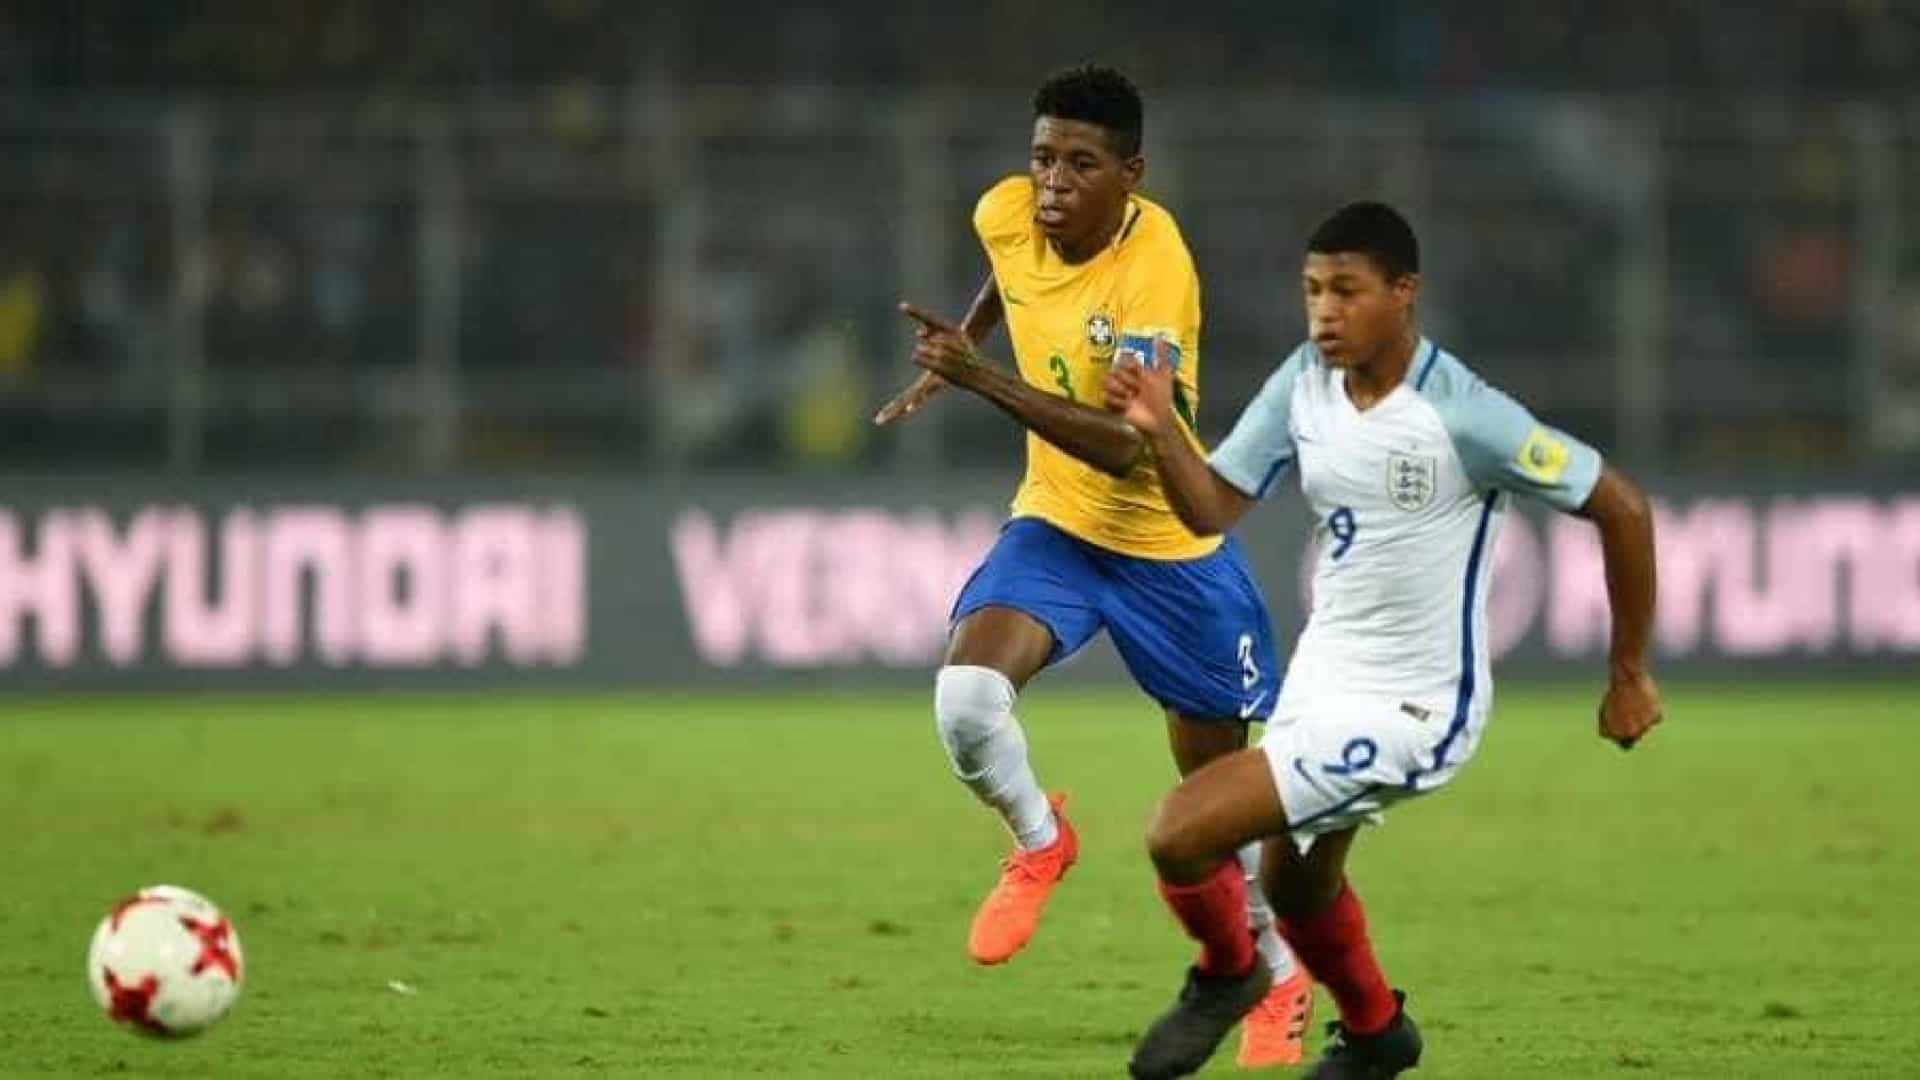 Brasil perde para a Inglaterra na semifinal do Mundial Sub-17